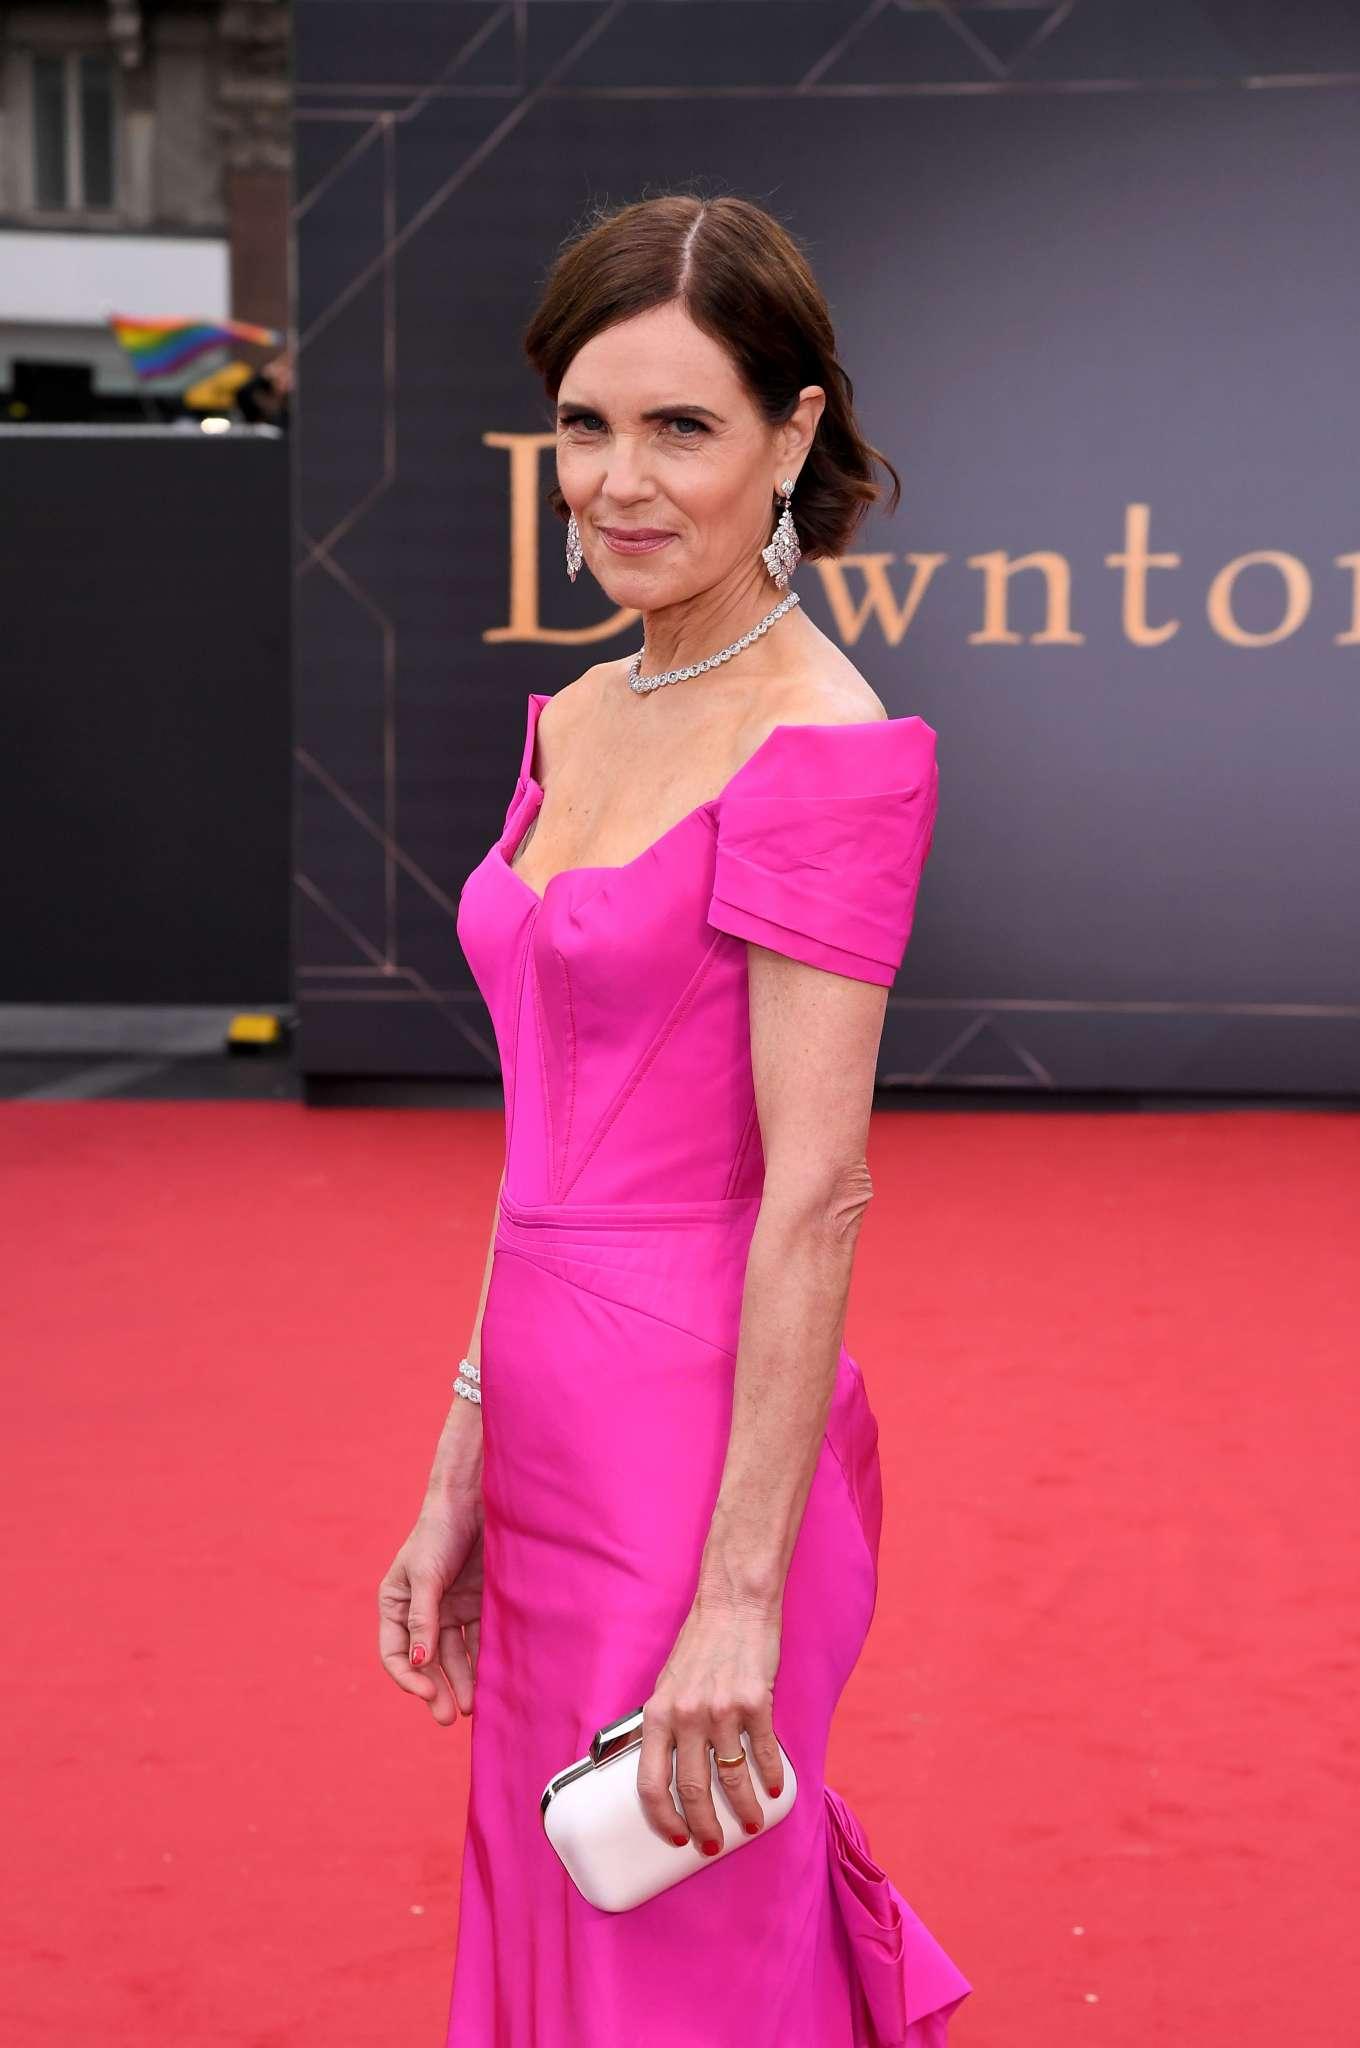 Elizabeth McGovern - 'Downton Abbey' Premiere in London